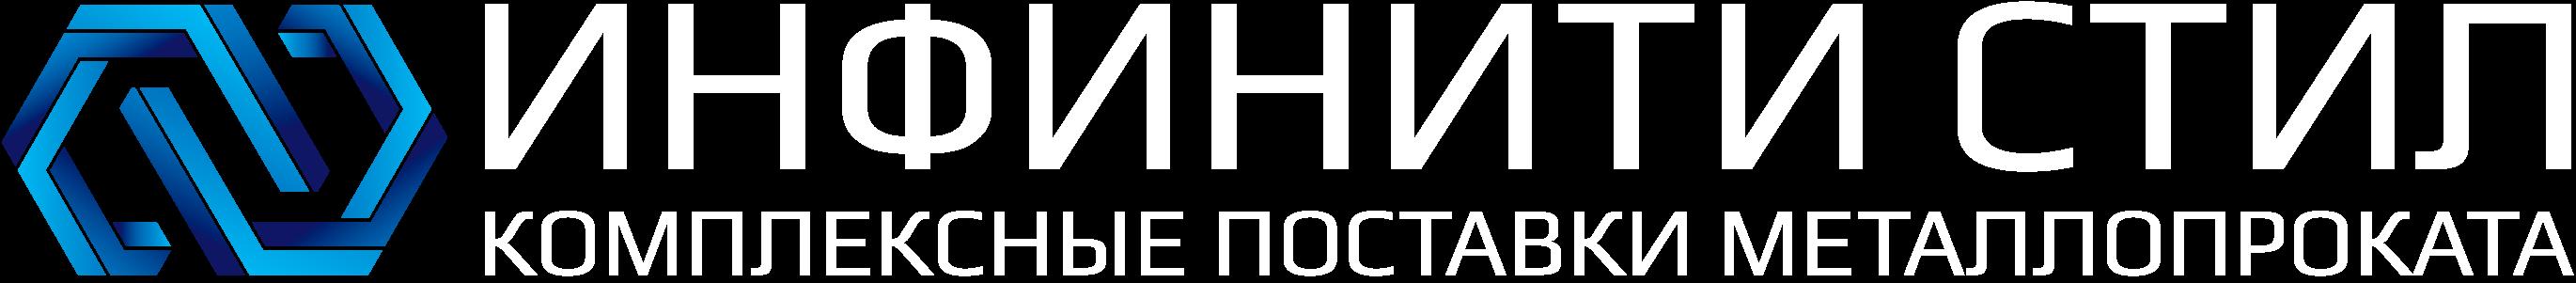 ООО ИНФИНИТИ СТИЛ